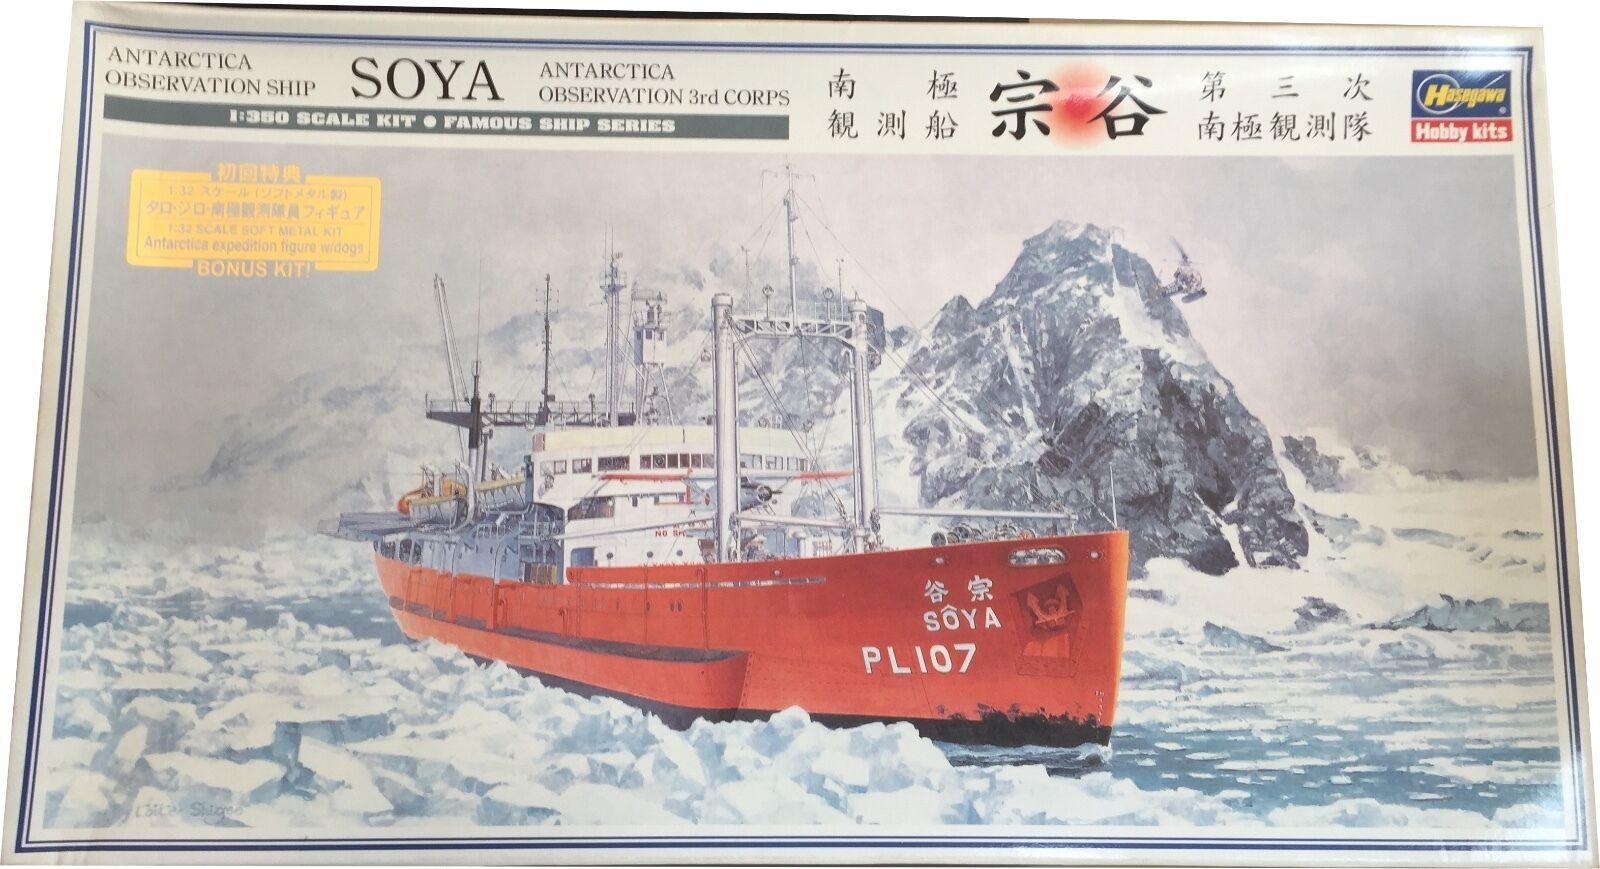 Hasegawa Antarctica Observation Ship Soya 3rd Corps Ref 40023 Escala 1 350,Nuevo